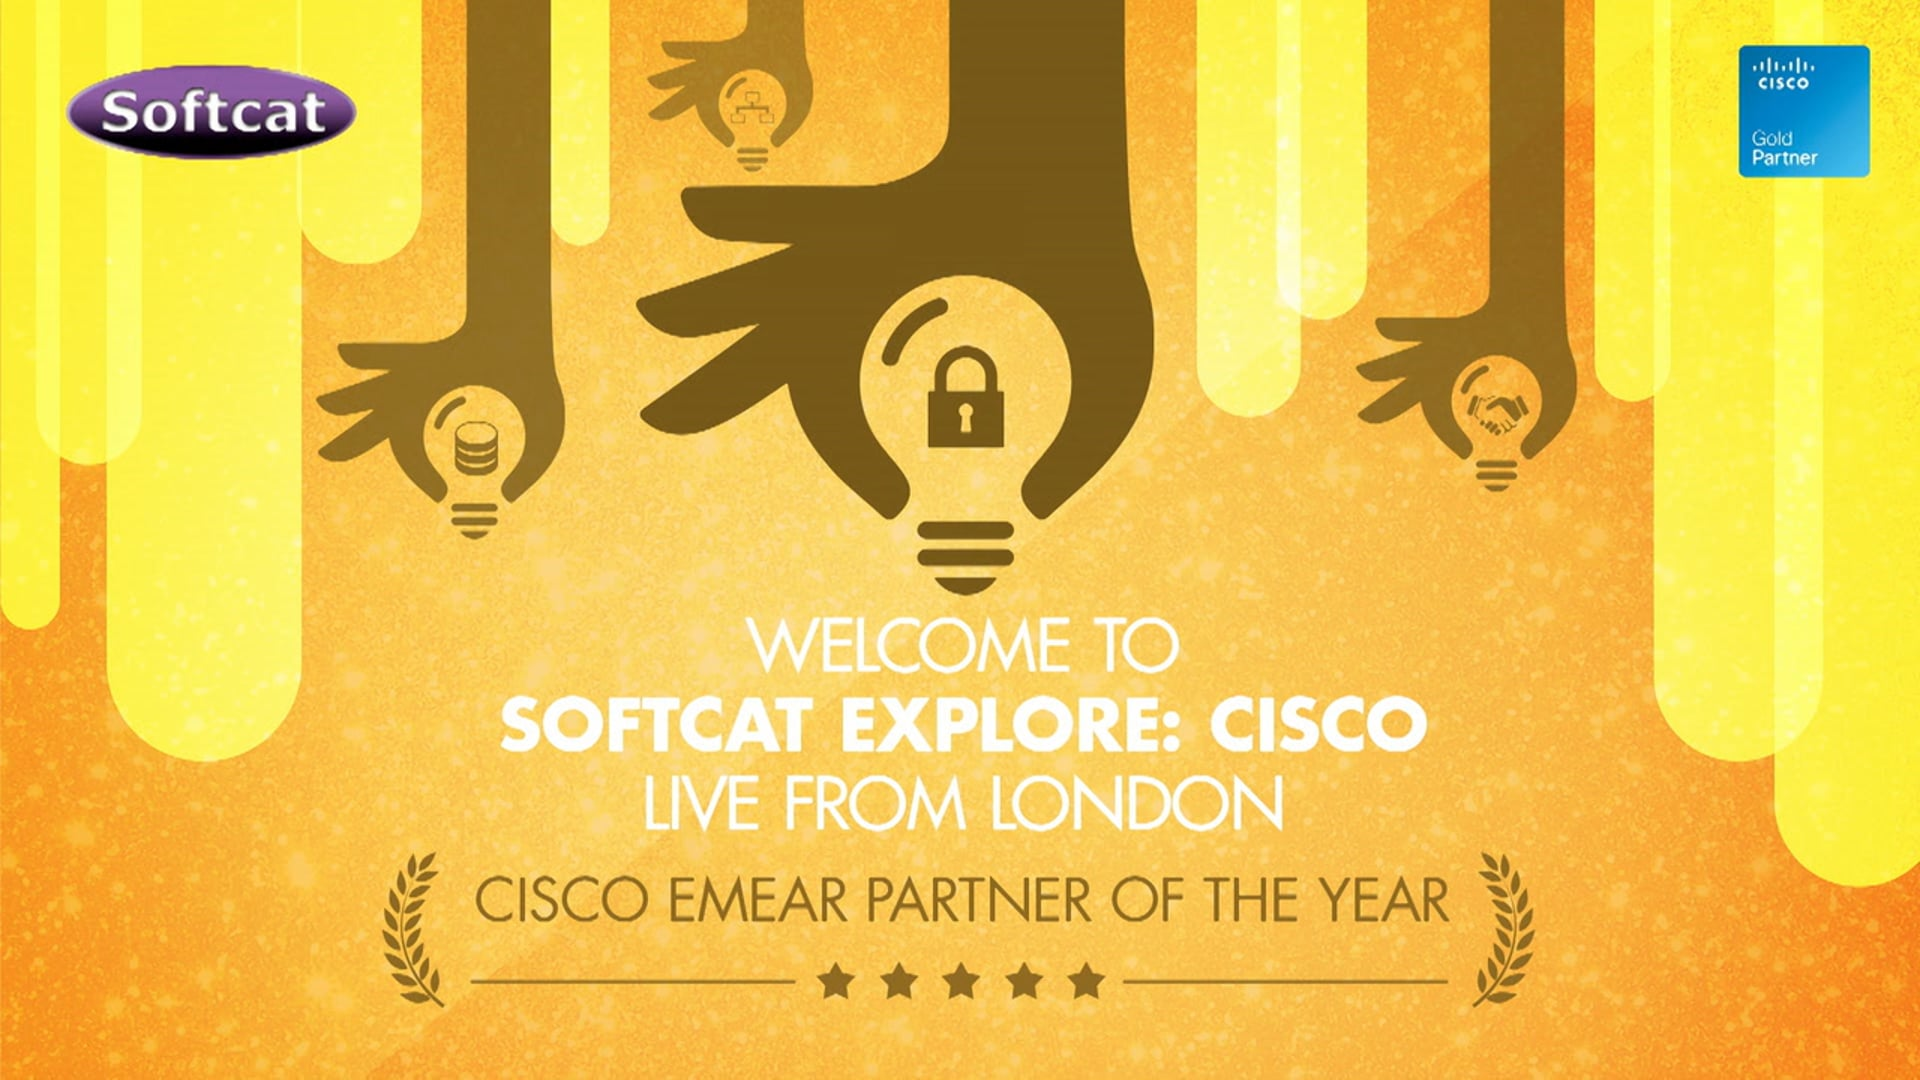 Softcat Explore: Cisco